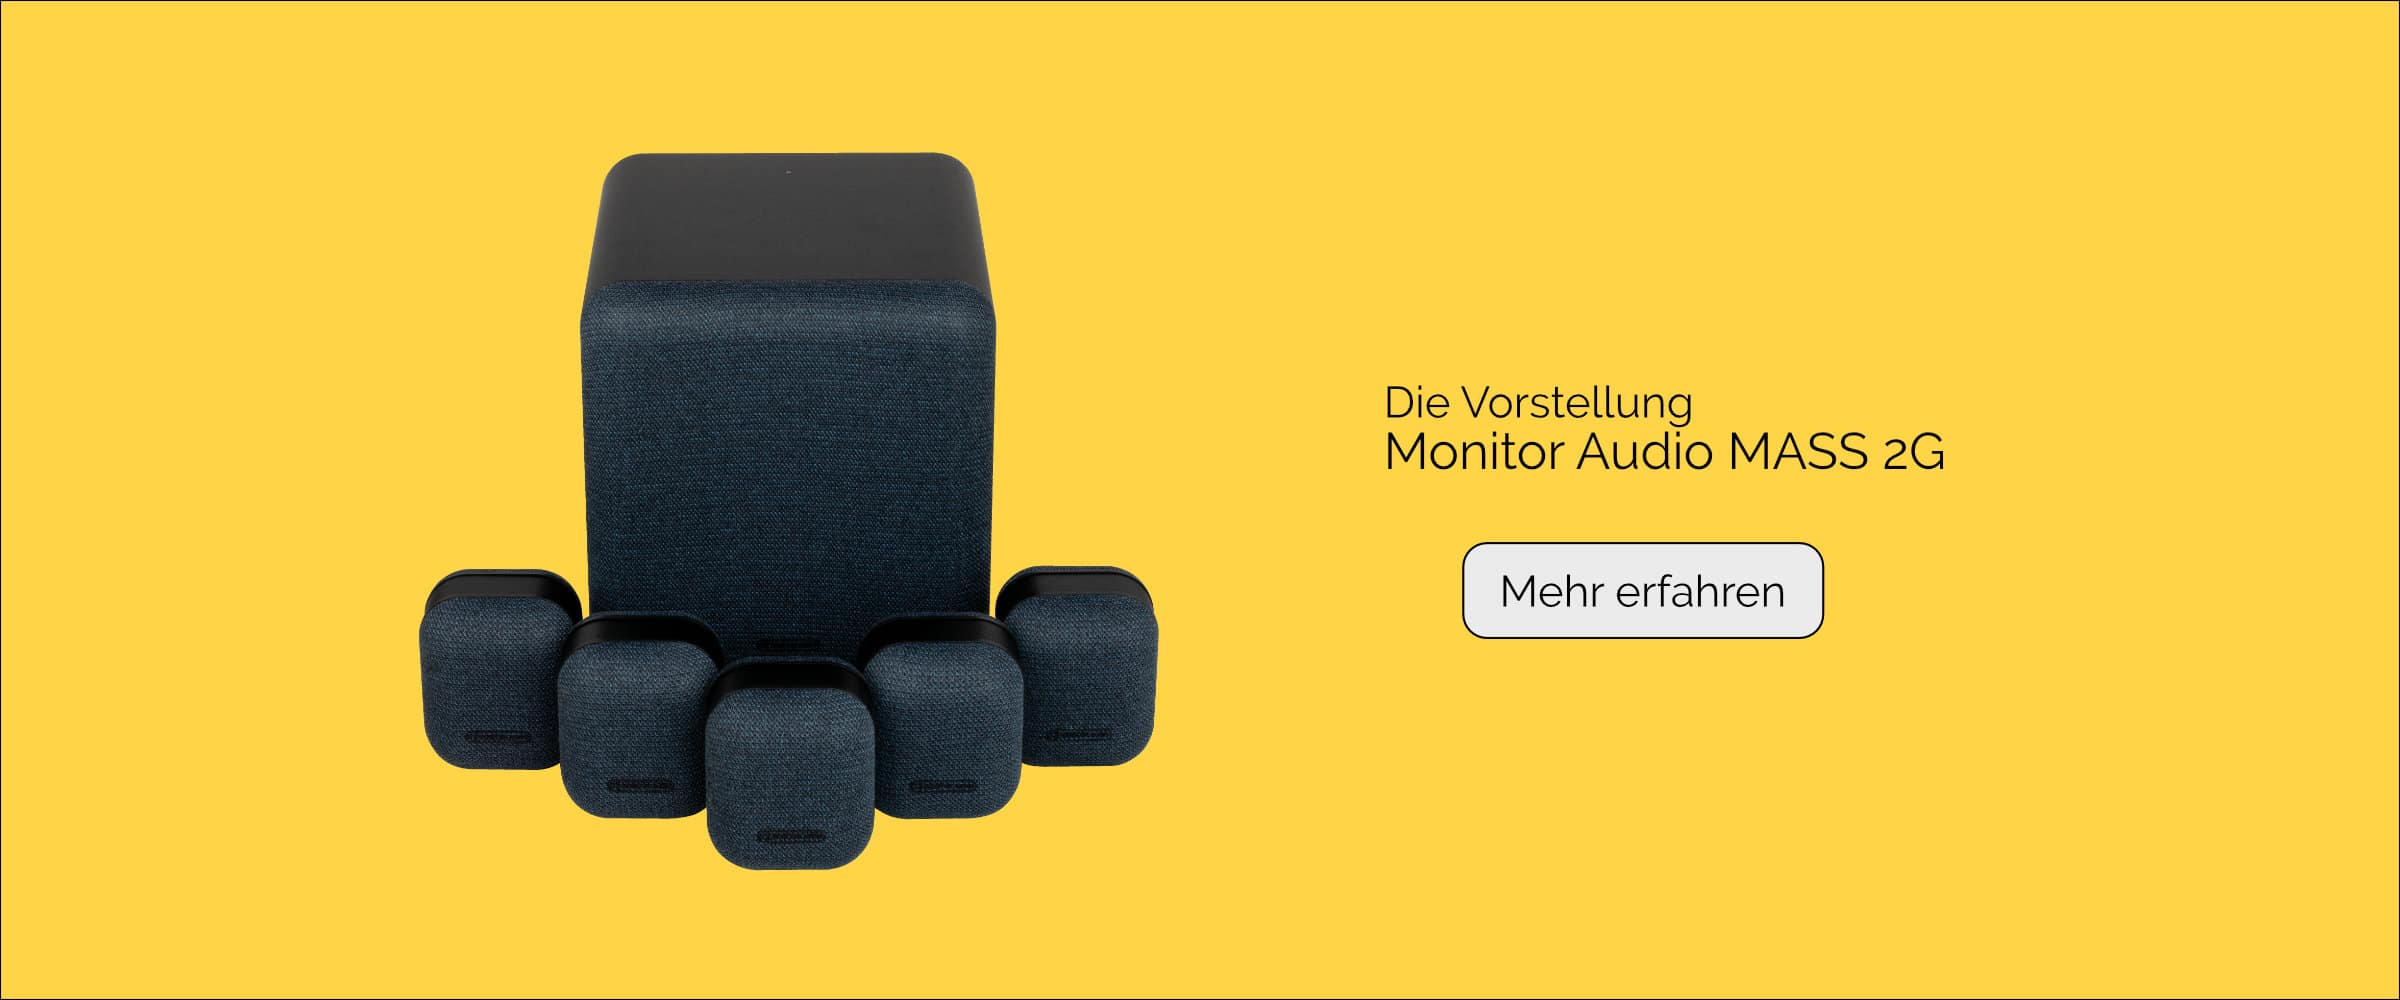 Monitor Audio MASS 2G-Banner